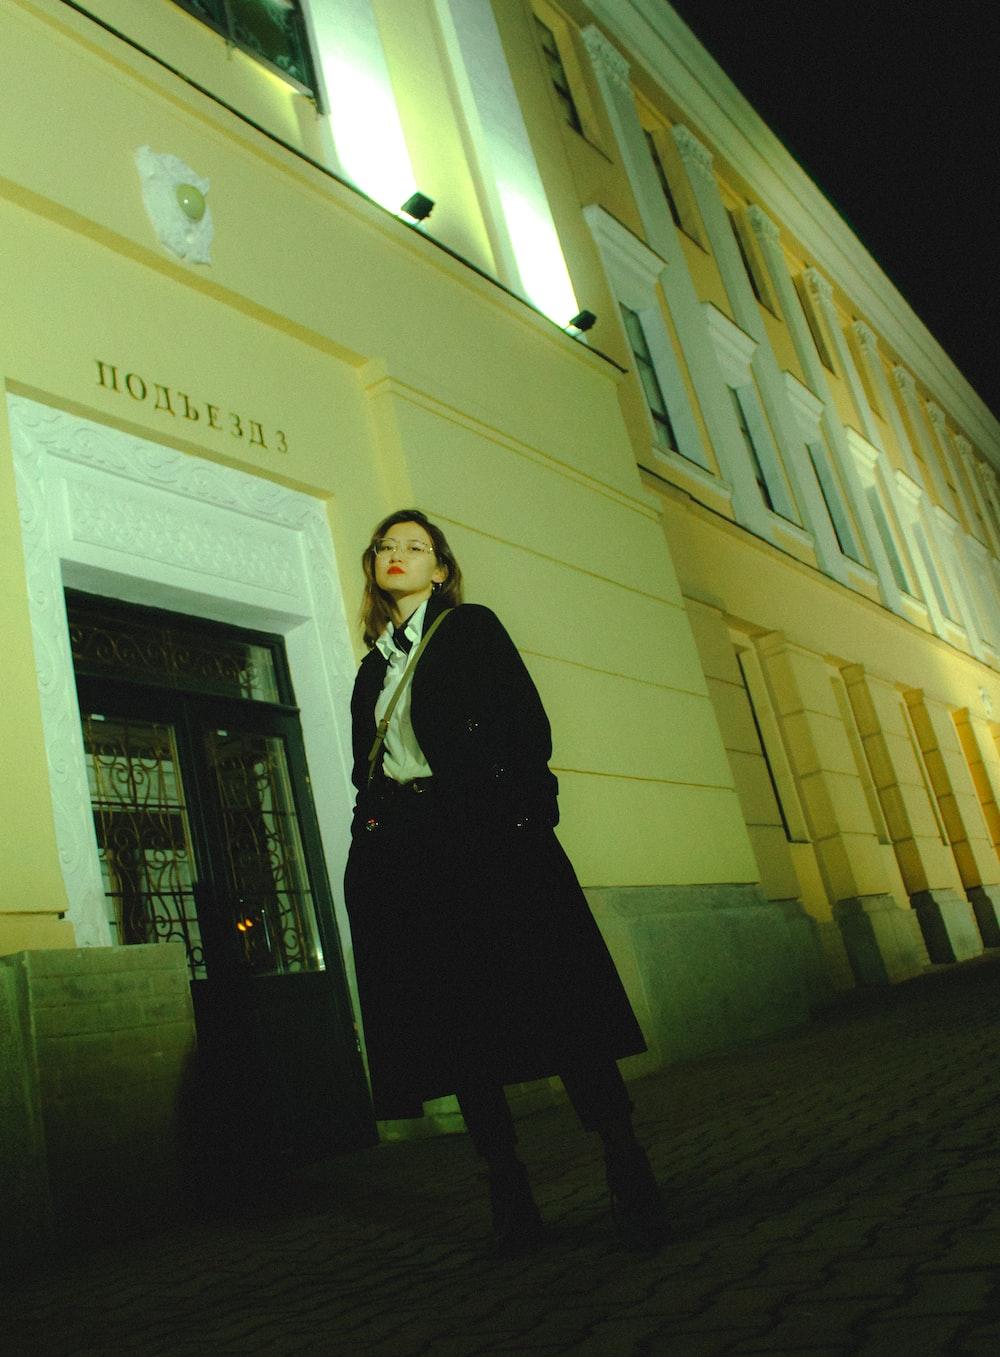 woman standing beside building